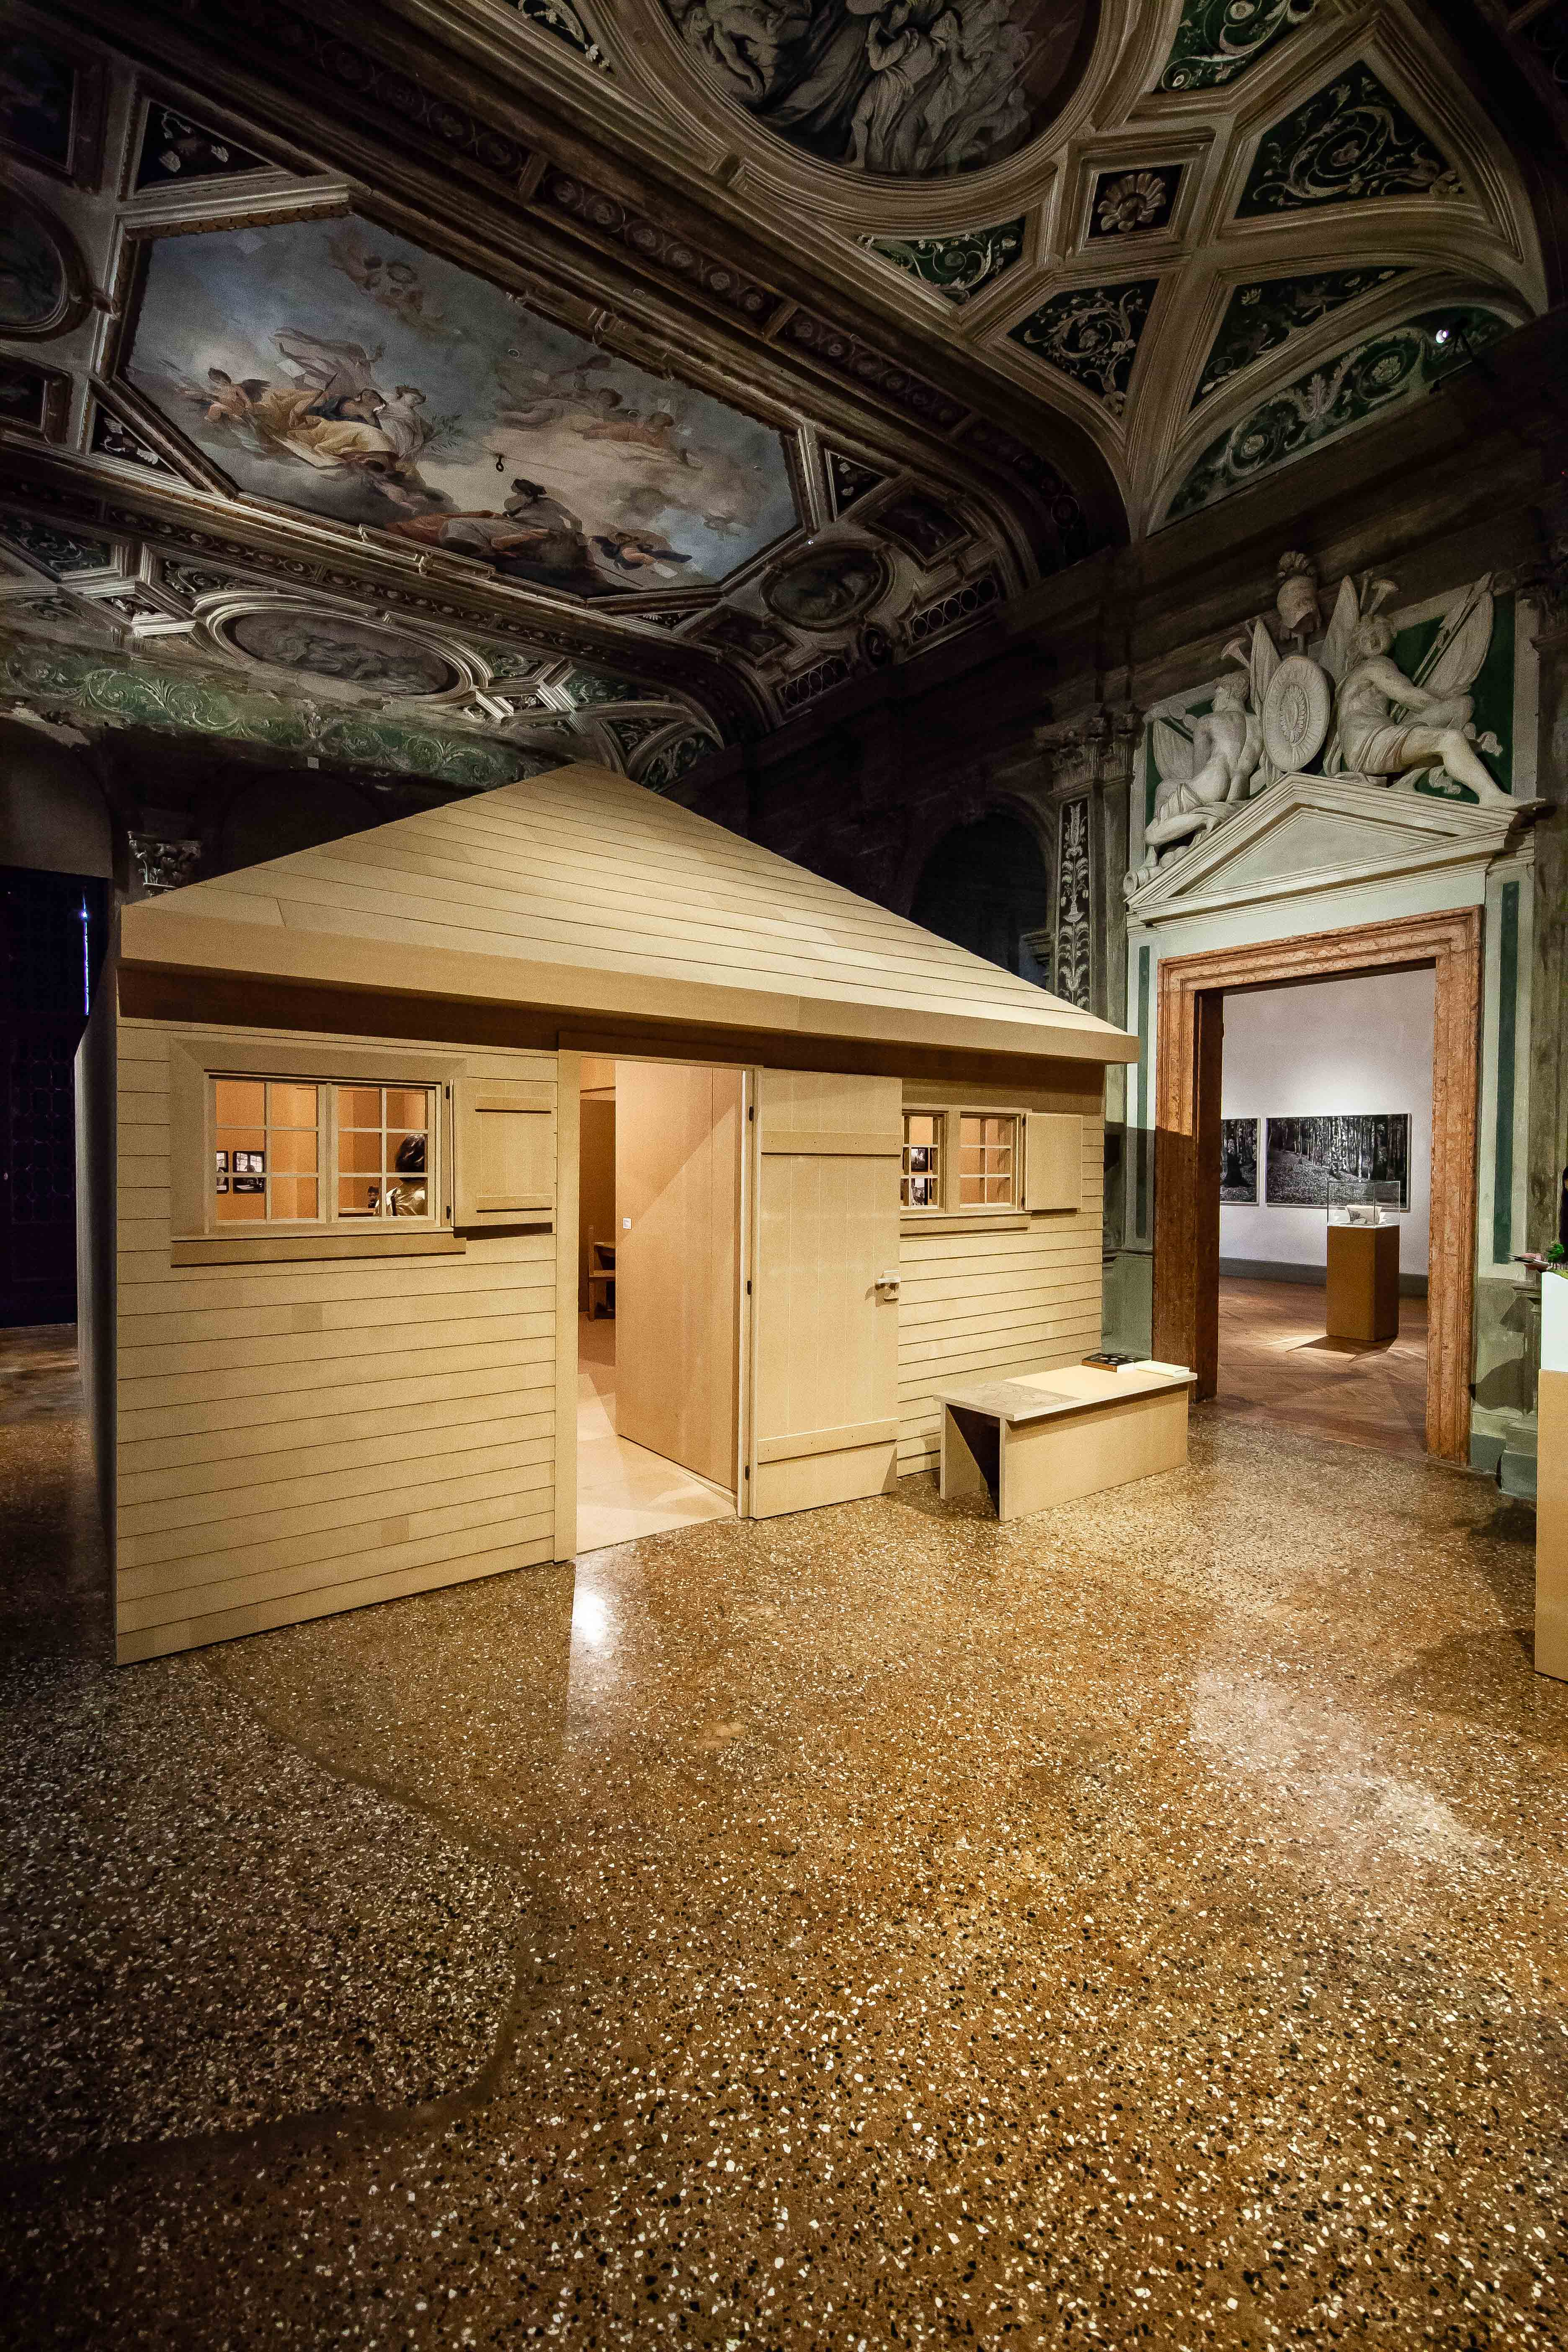 Heideggers Hut